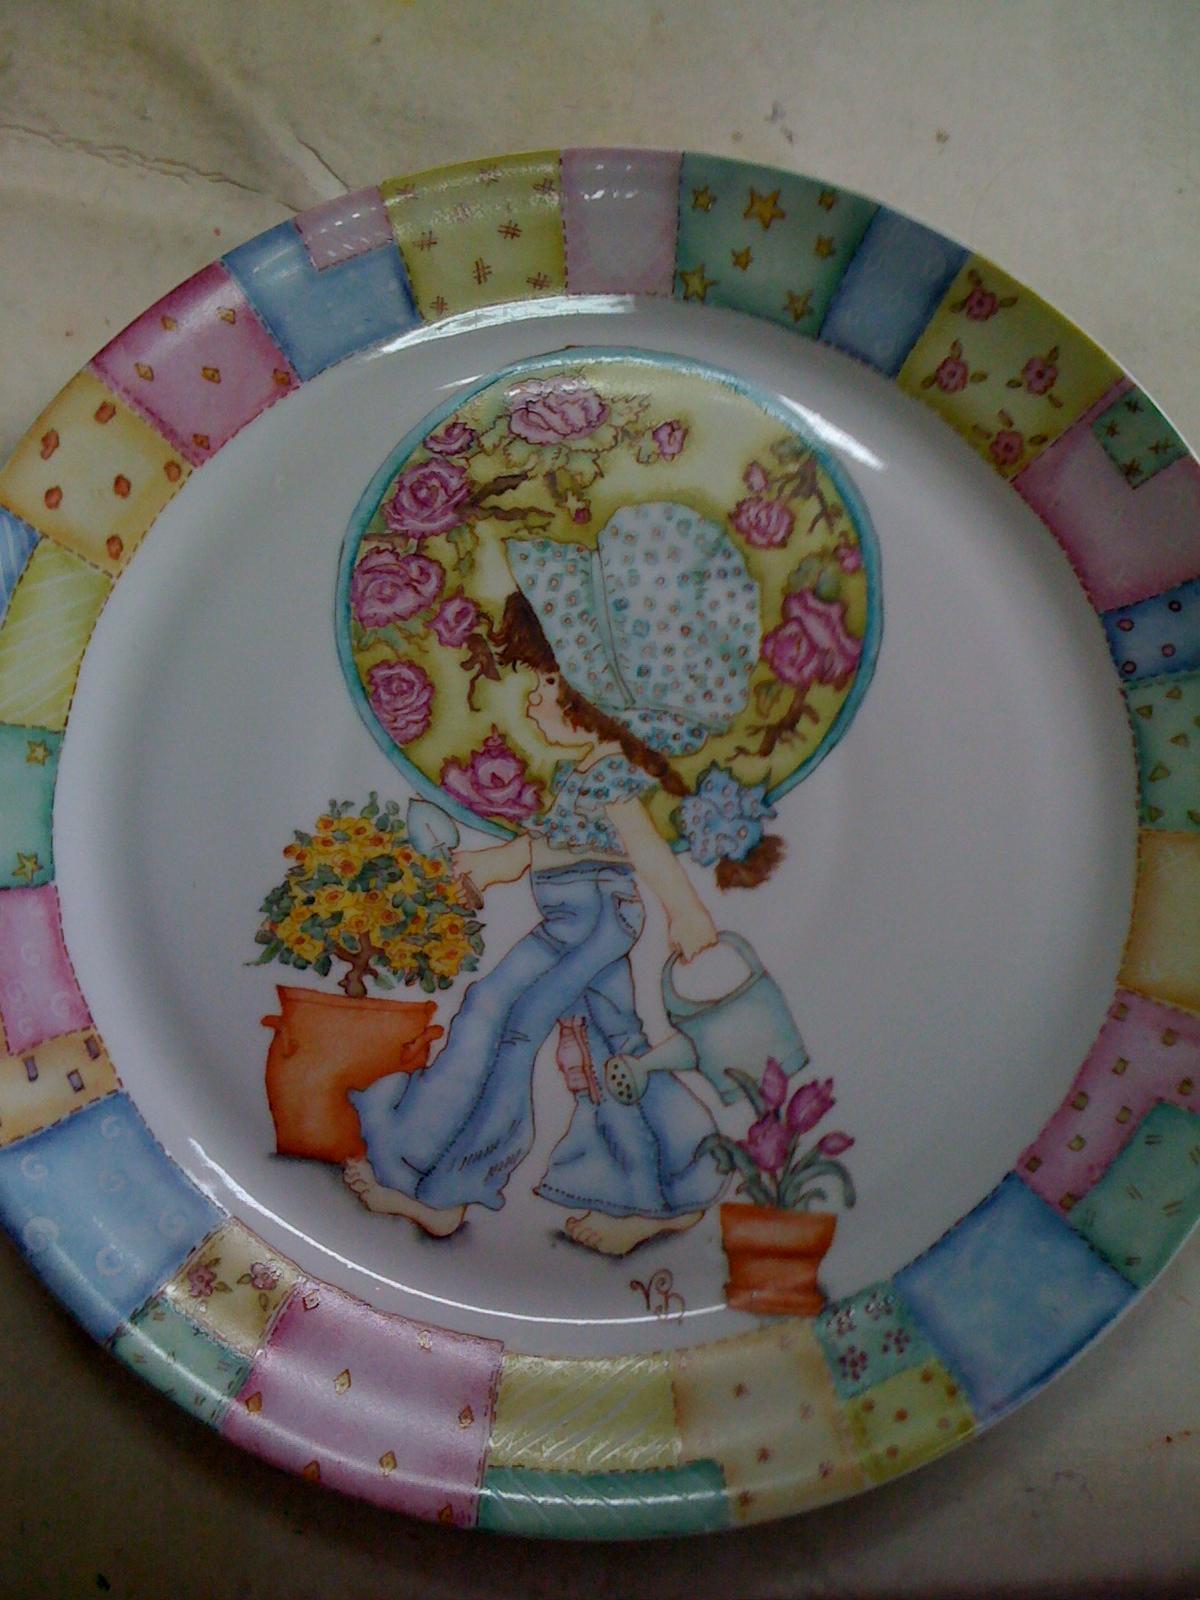 Viviana Dimieri - Pintura en porcelana